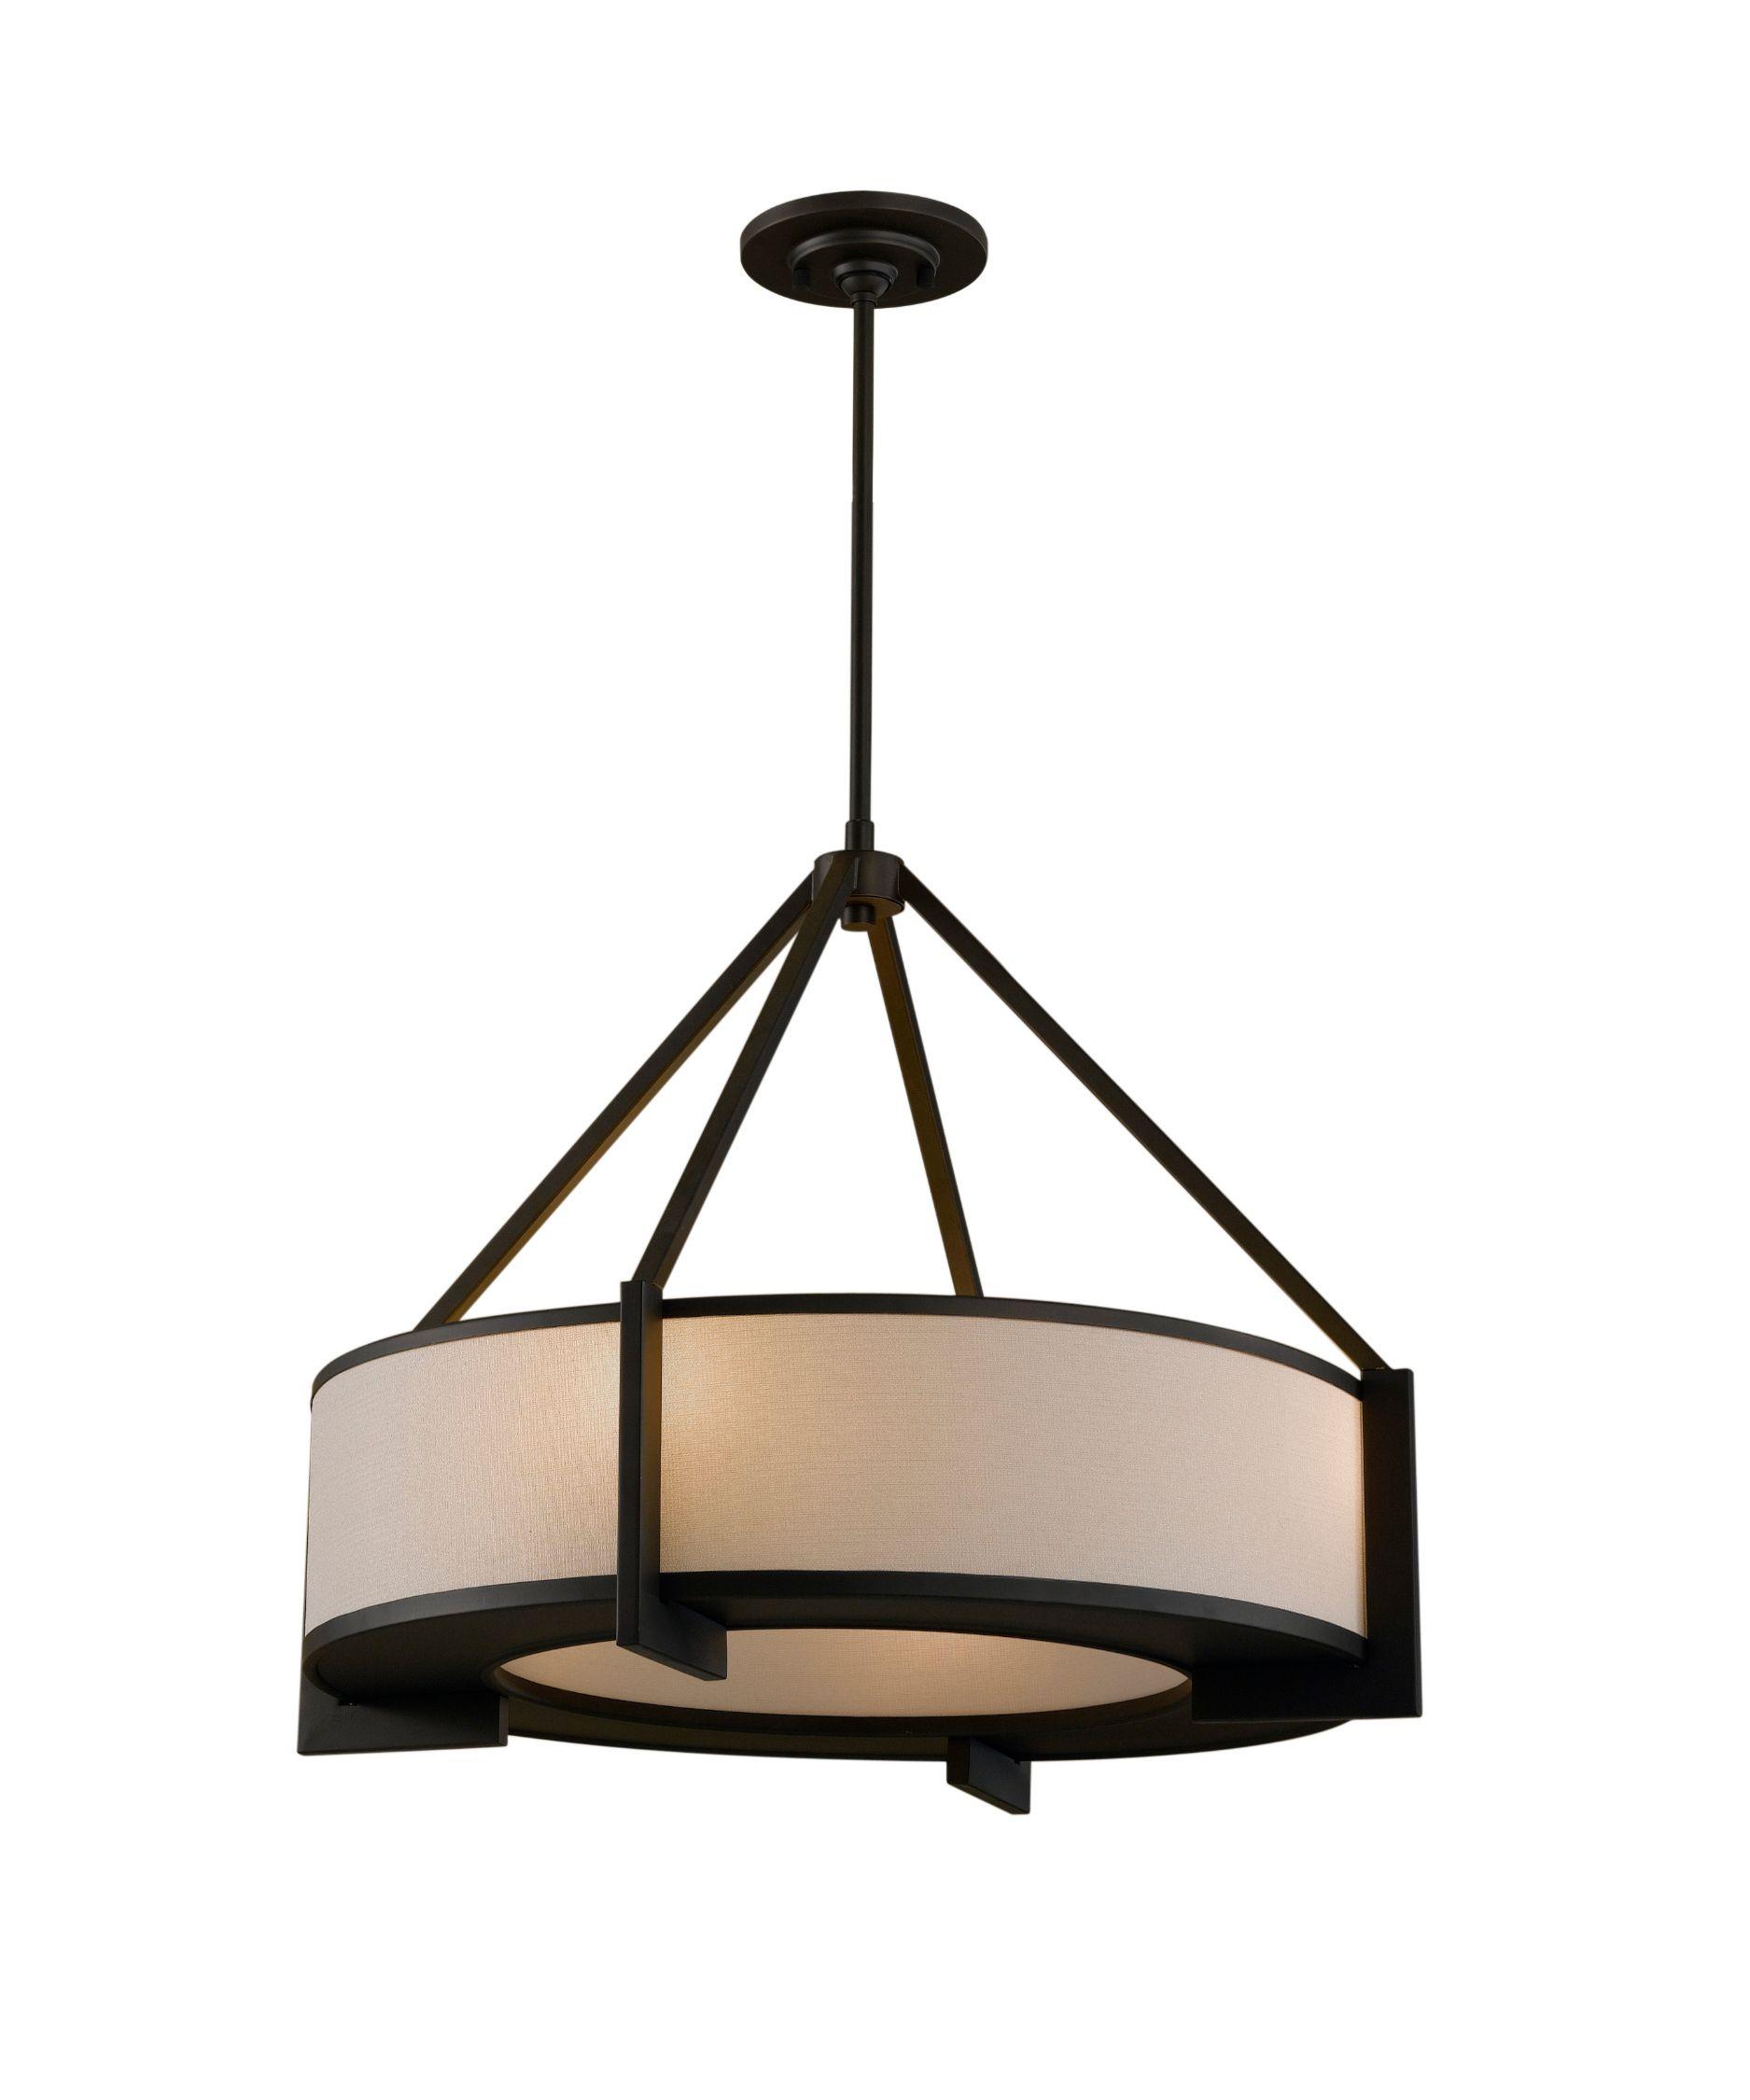 Murray Feiss Foyer Lighting: Stelle Pendant By Murray Feiss #lighting. Click The Image